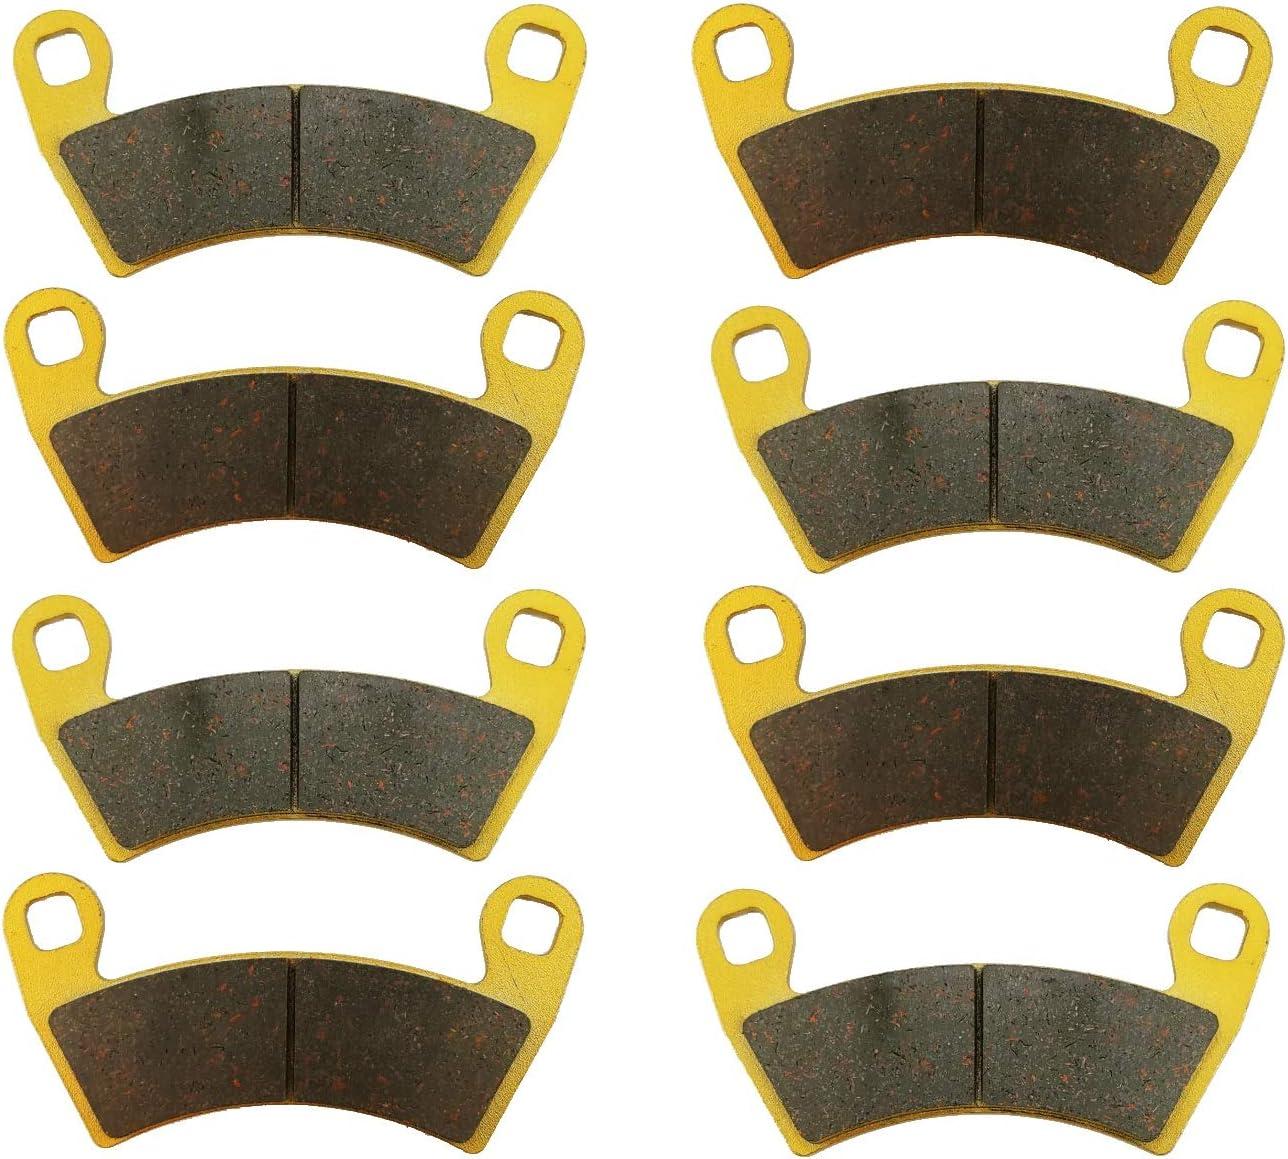 Polaris Popularity Ranger Crew XP 570-6 2016 Ceramic Brake Quality inspection Set R Font Pad